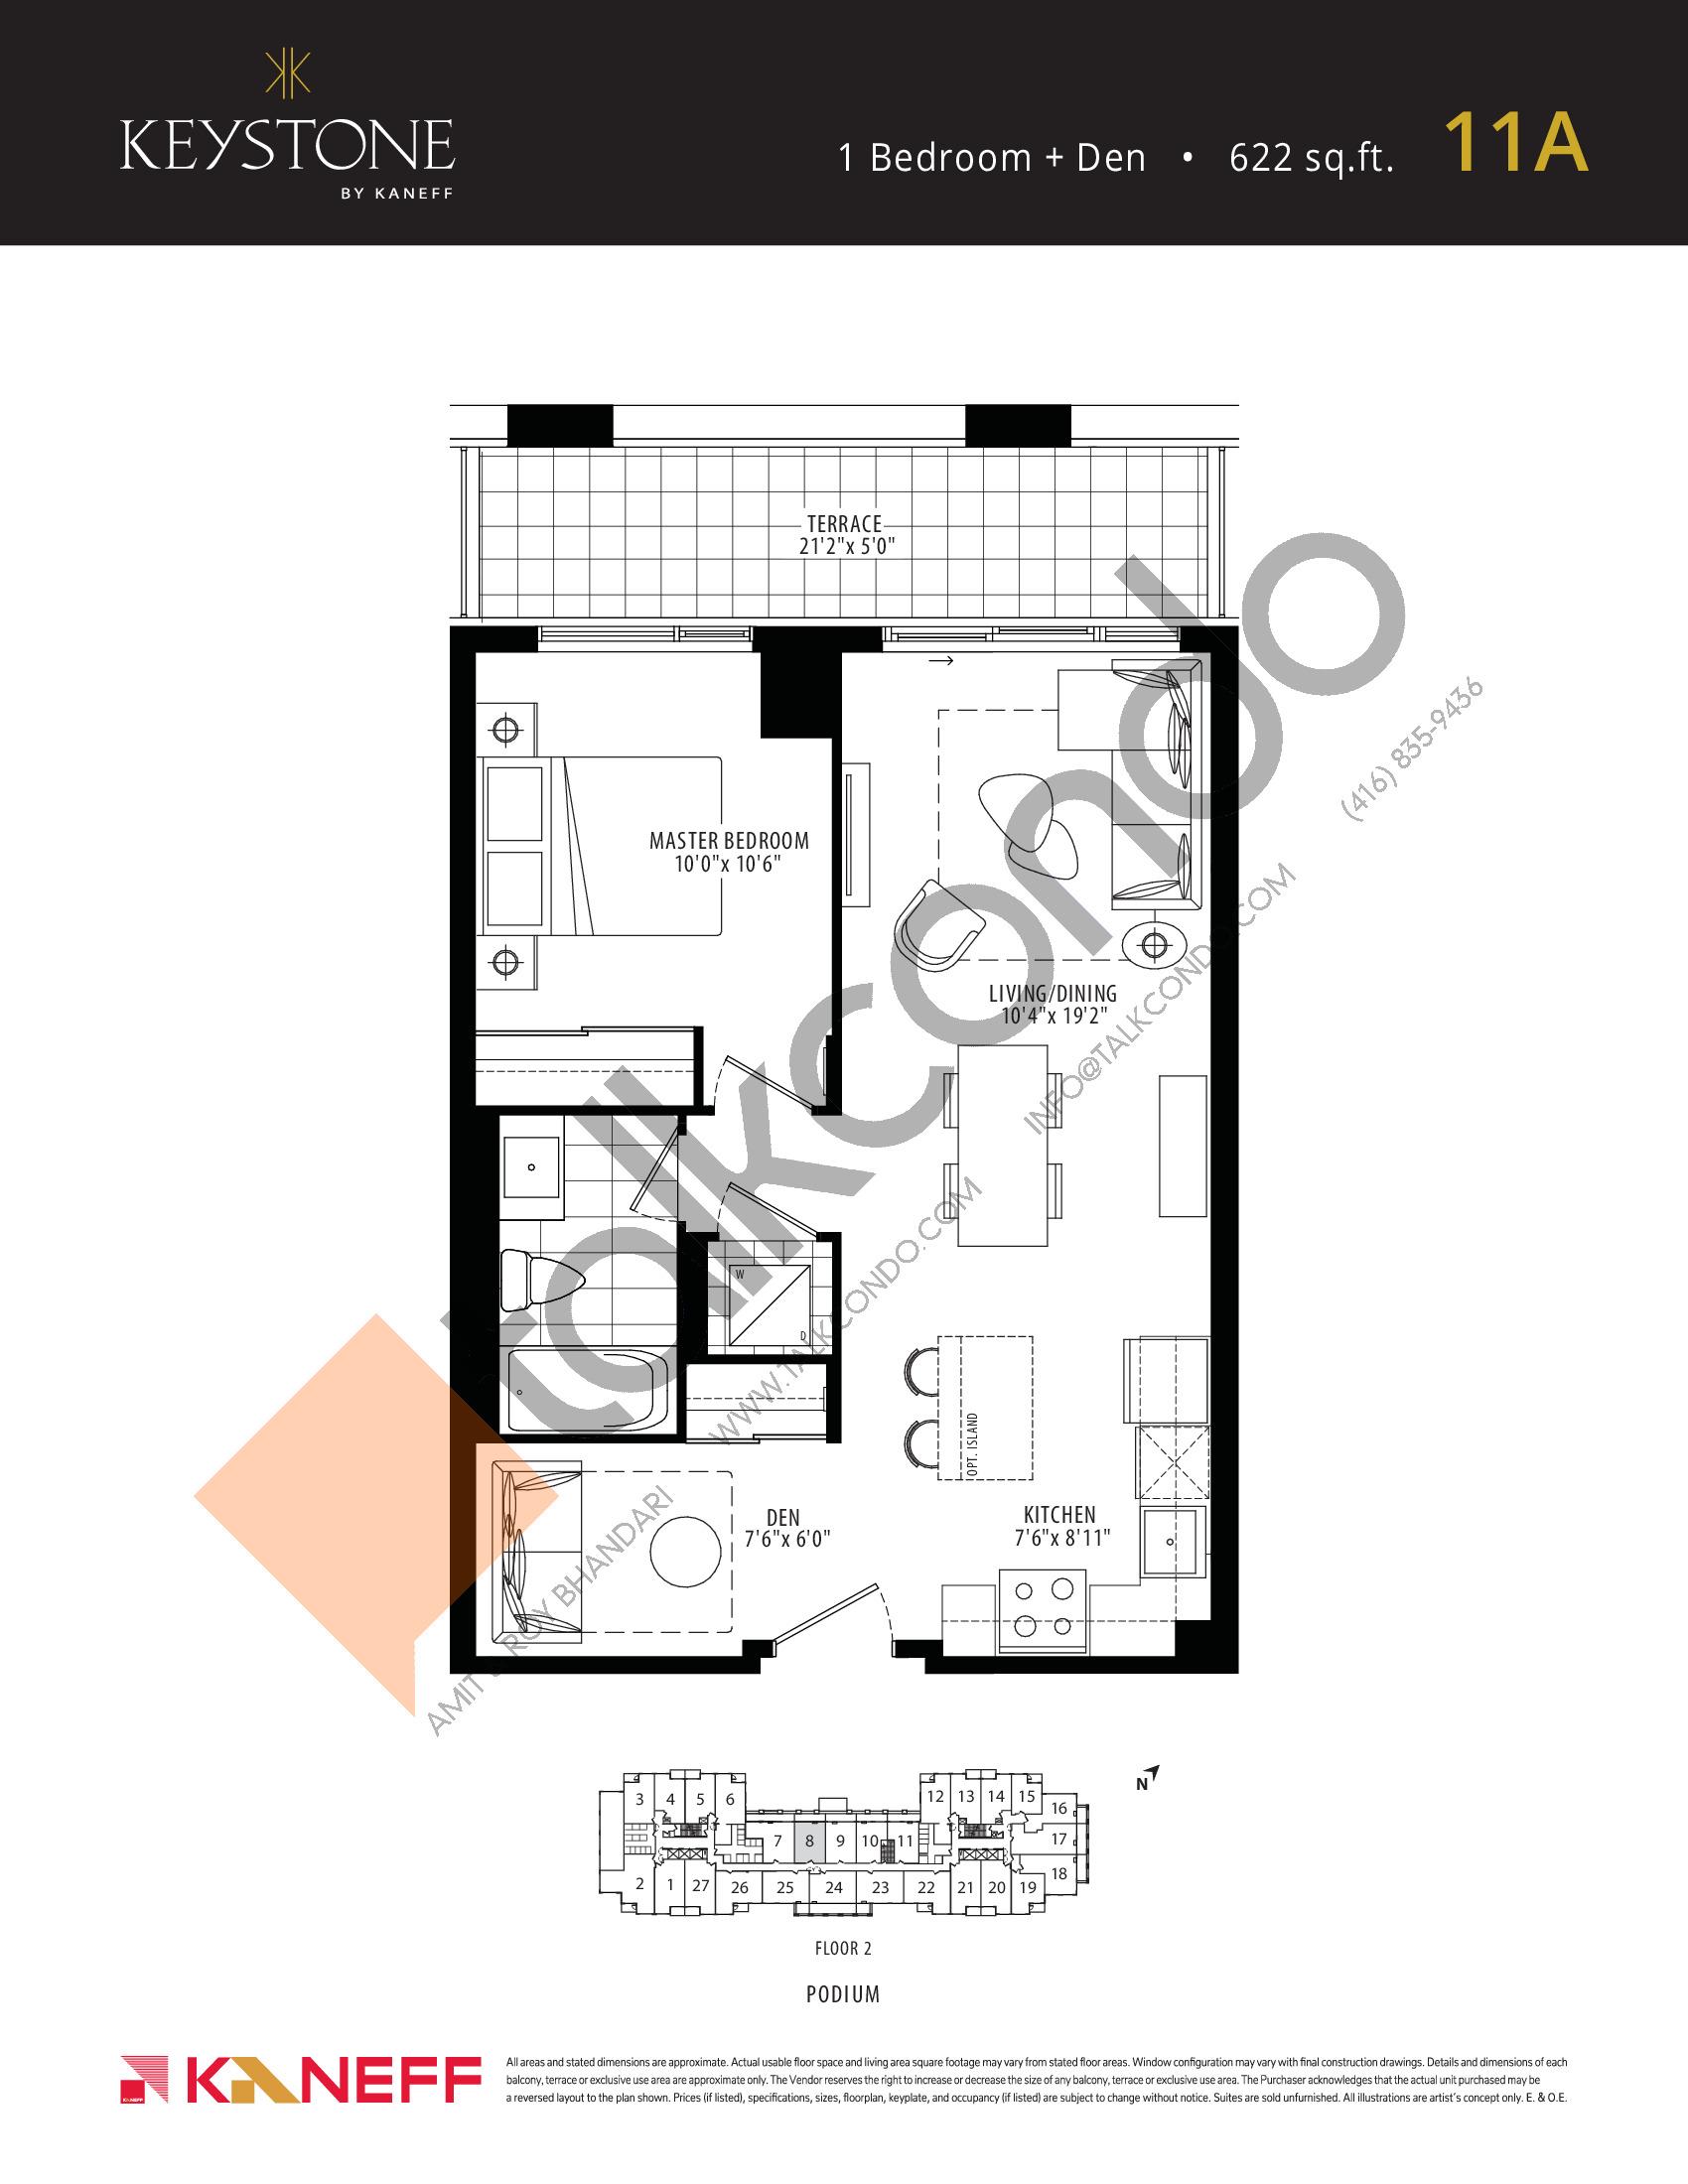 11A Floor Plan at Keystone Condos Phase 2 - 622 sq.ft